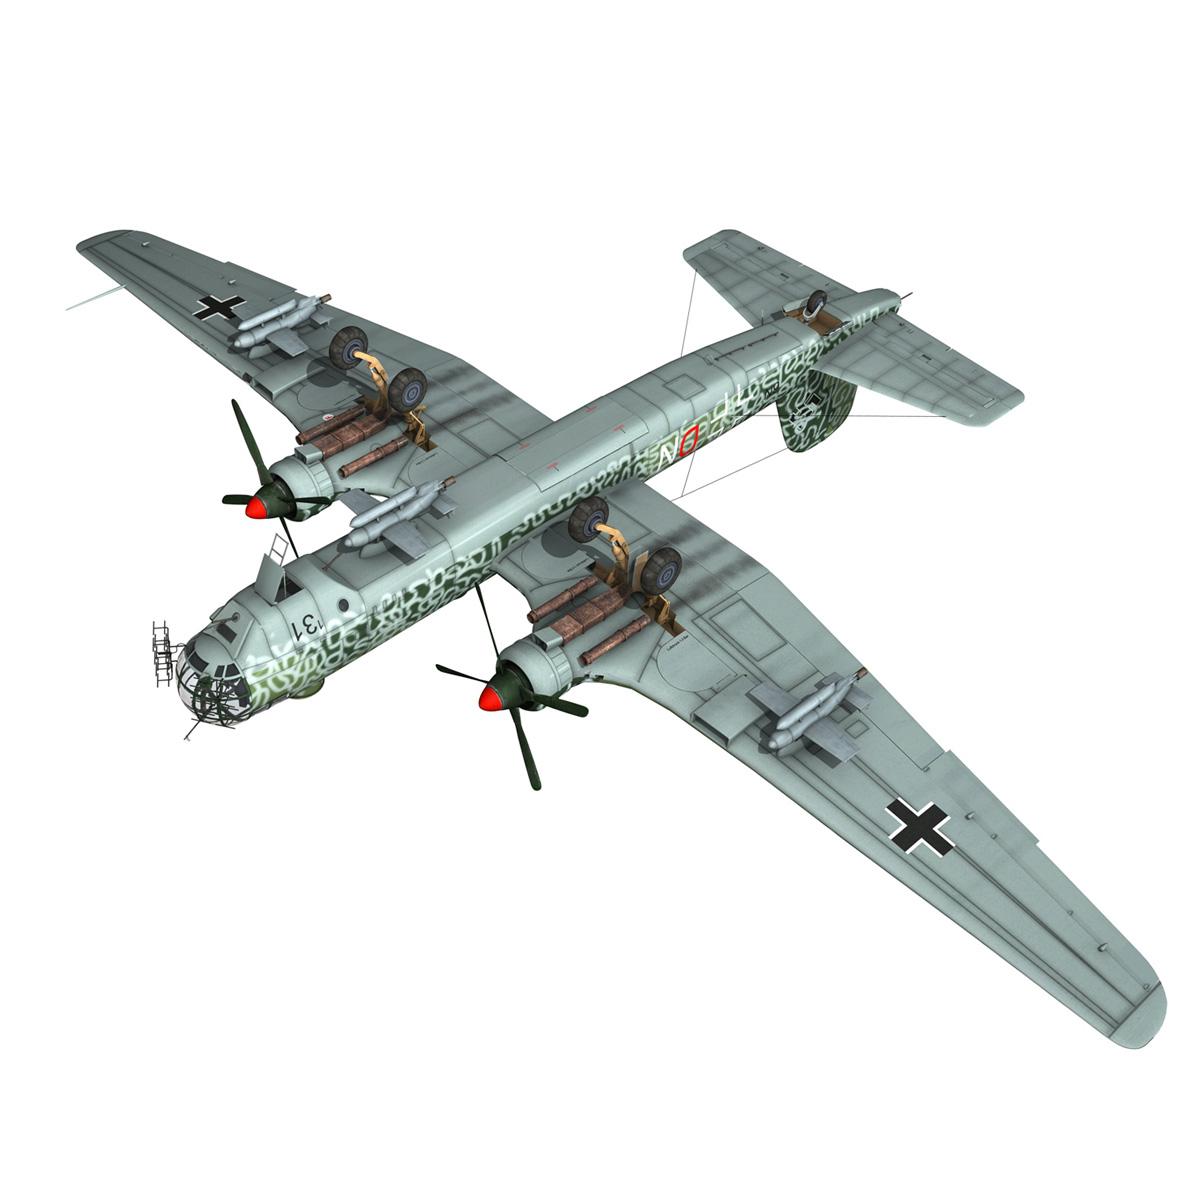 heinkel he-177 a-5 – greif – 6ndn 3d model 3ds fbx c4d lwo obj 201597